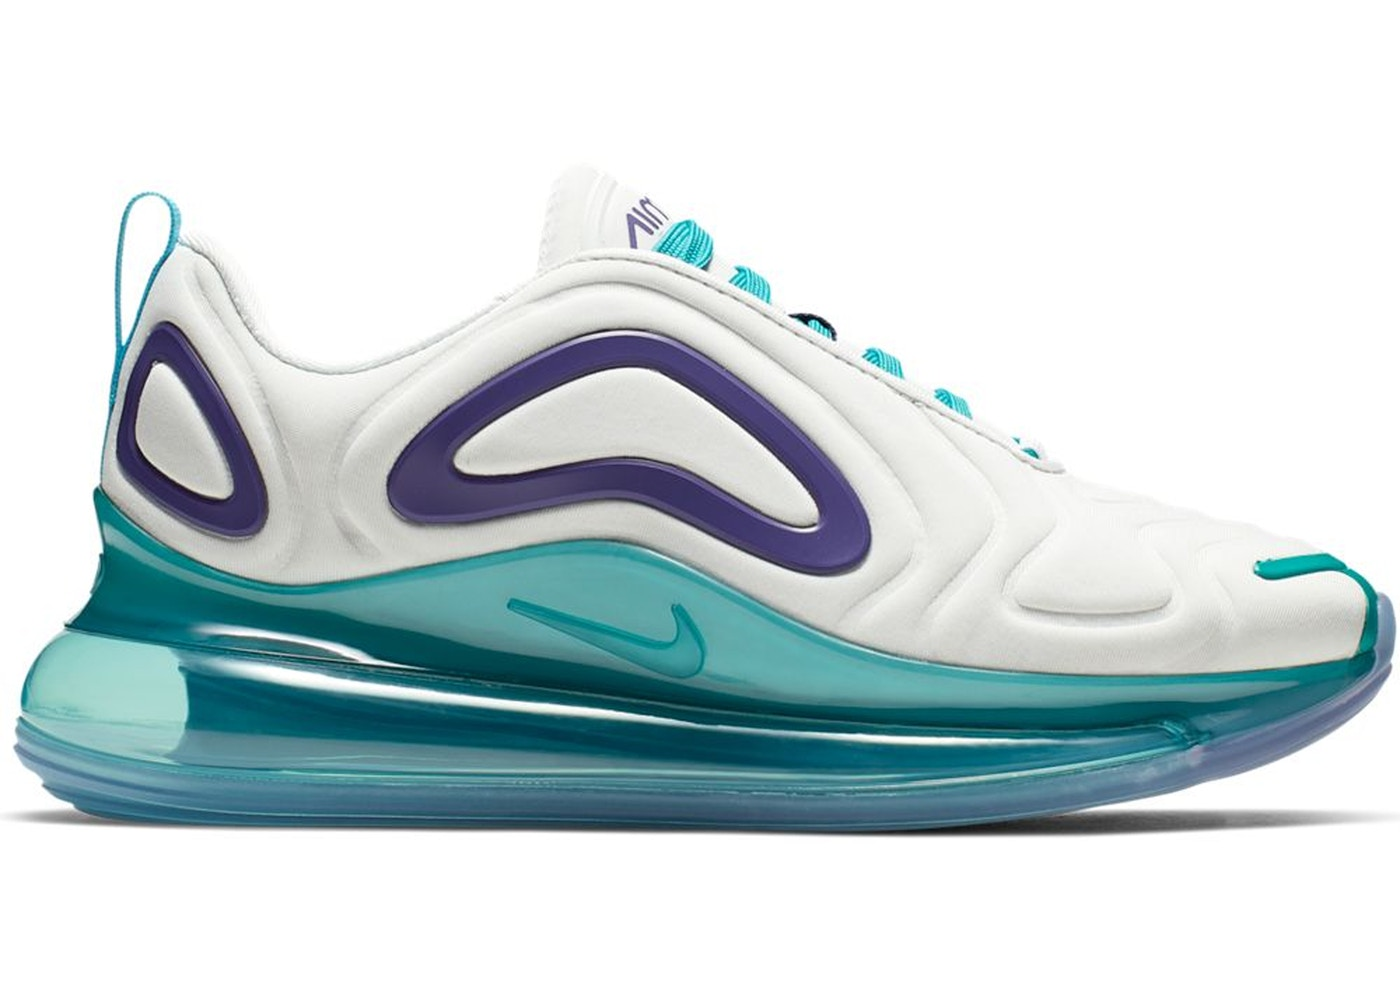 Travieso Isla de Alcatraz financiero  Nike Air Max 720 White Spirit Teal Court Purple (W) - AR9293-100